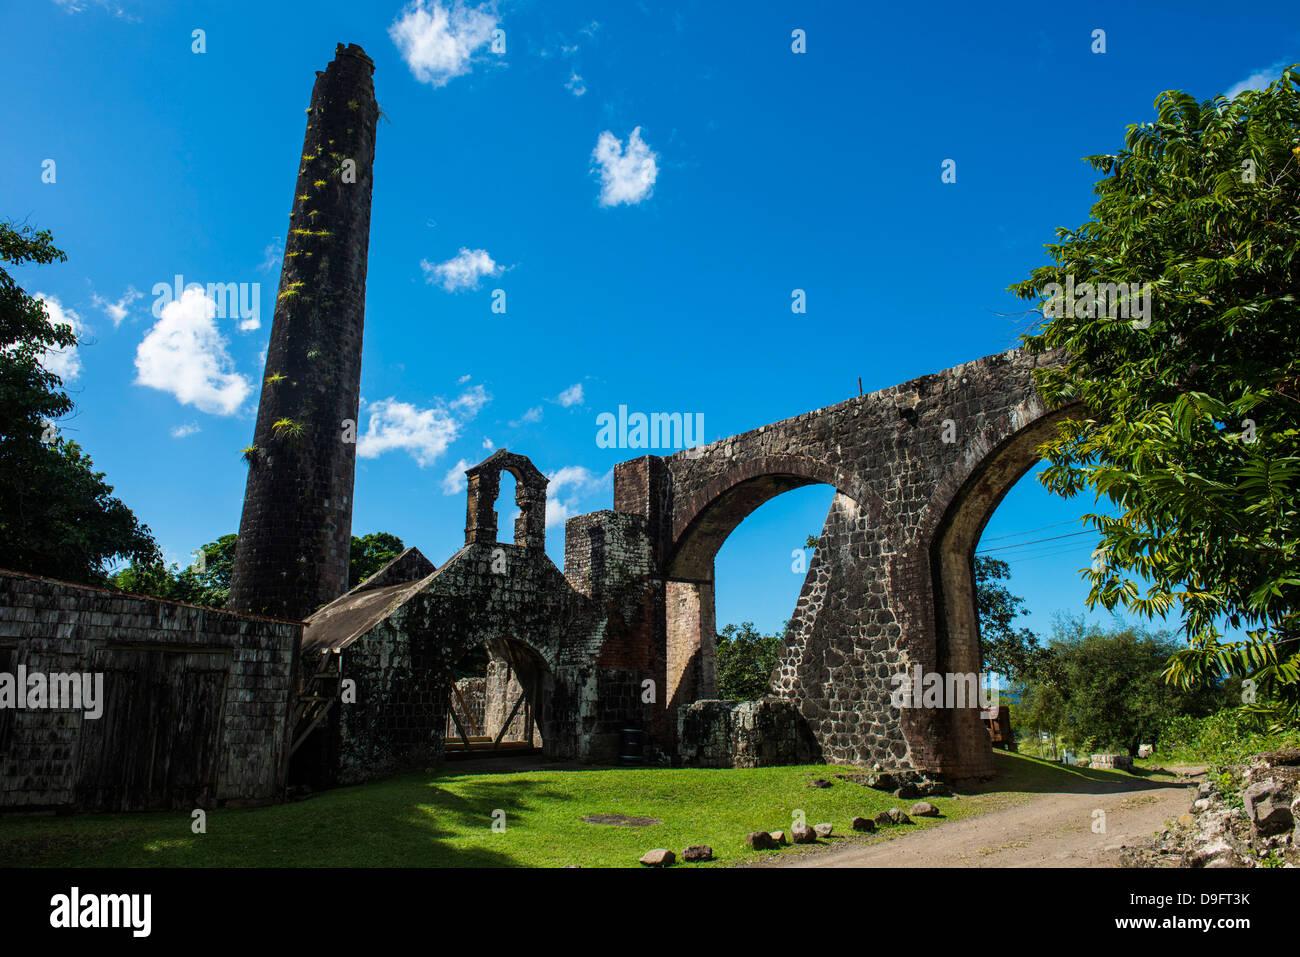 Ruinen einer alten Mühle, St. Kitt, St. Kitts und Nevis, Leeward-Inseln, West Indies, Karibik Stockbild